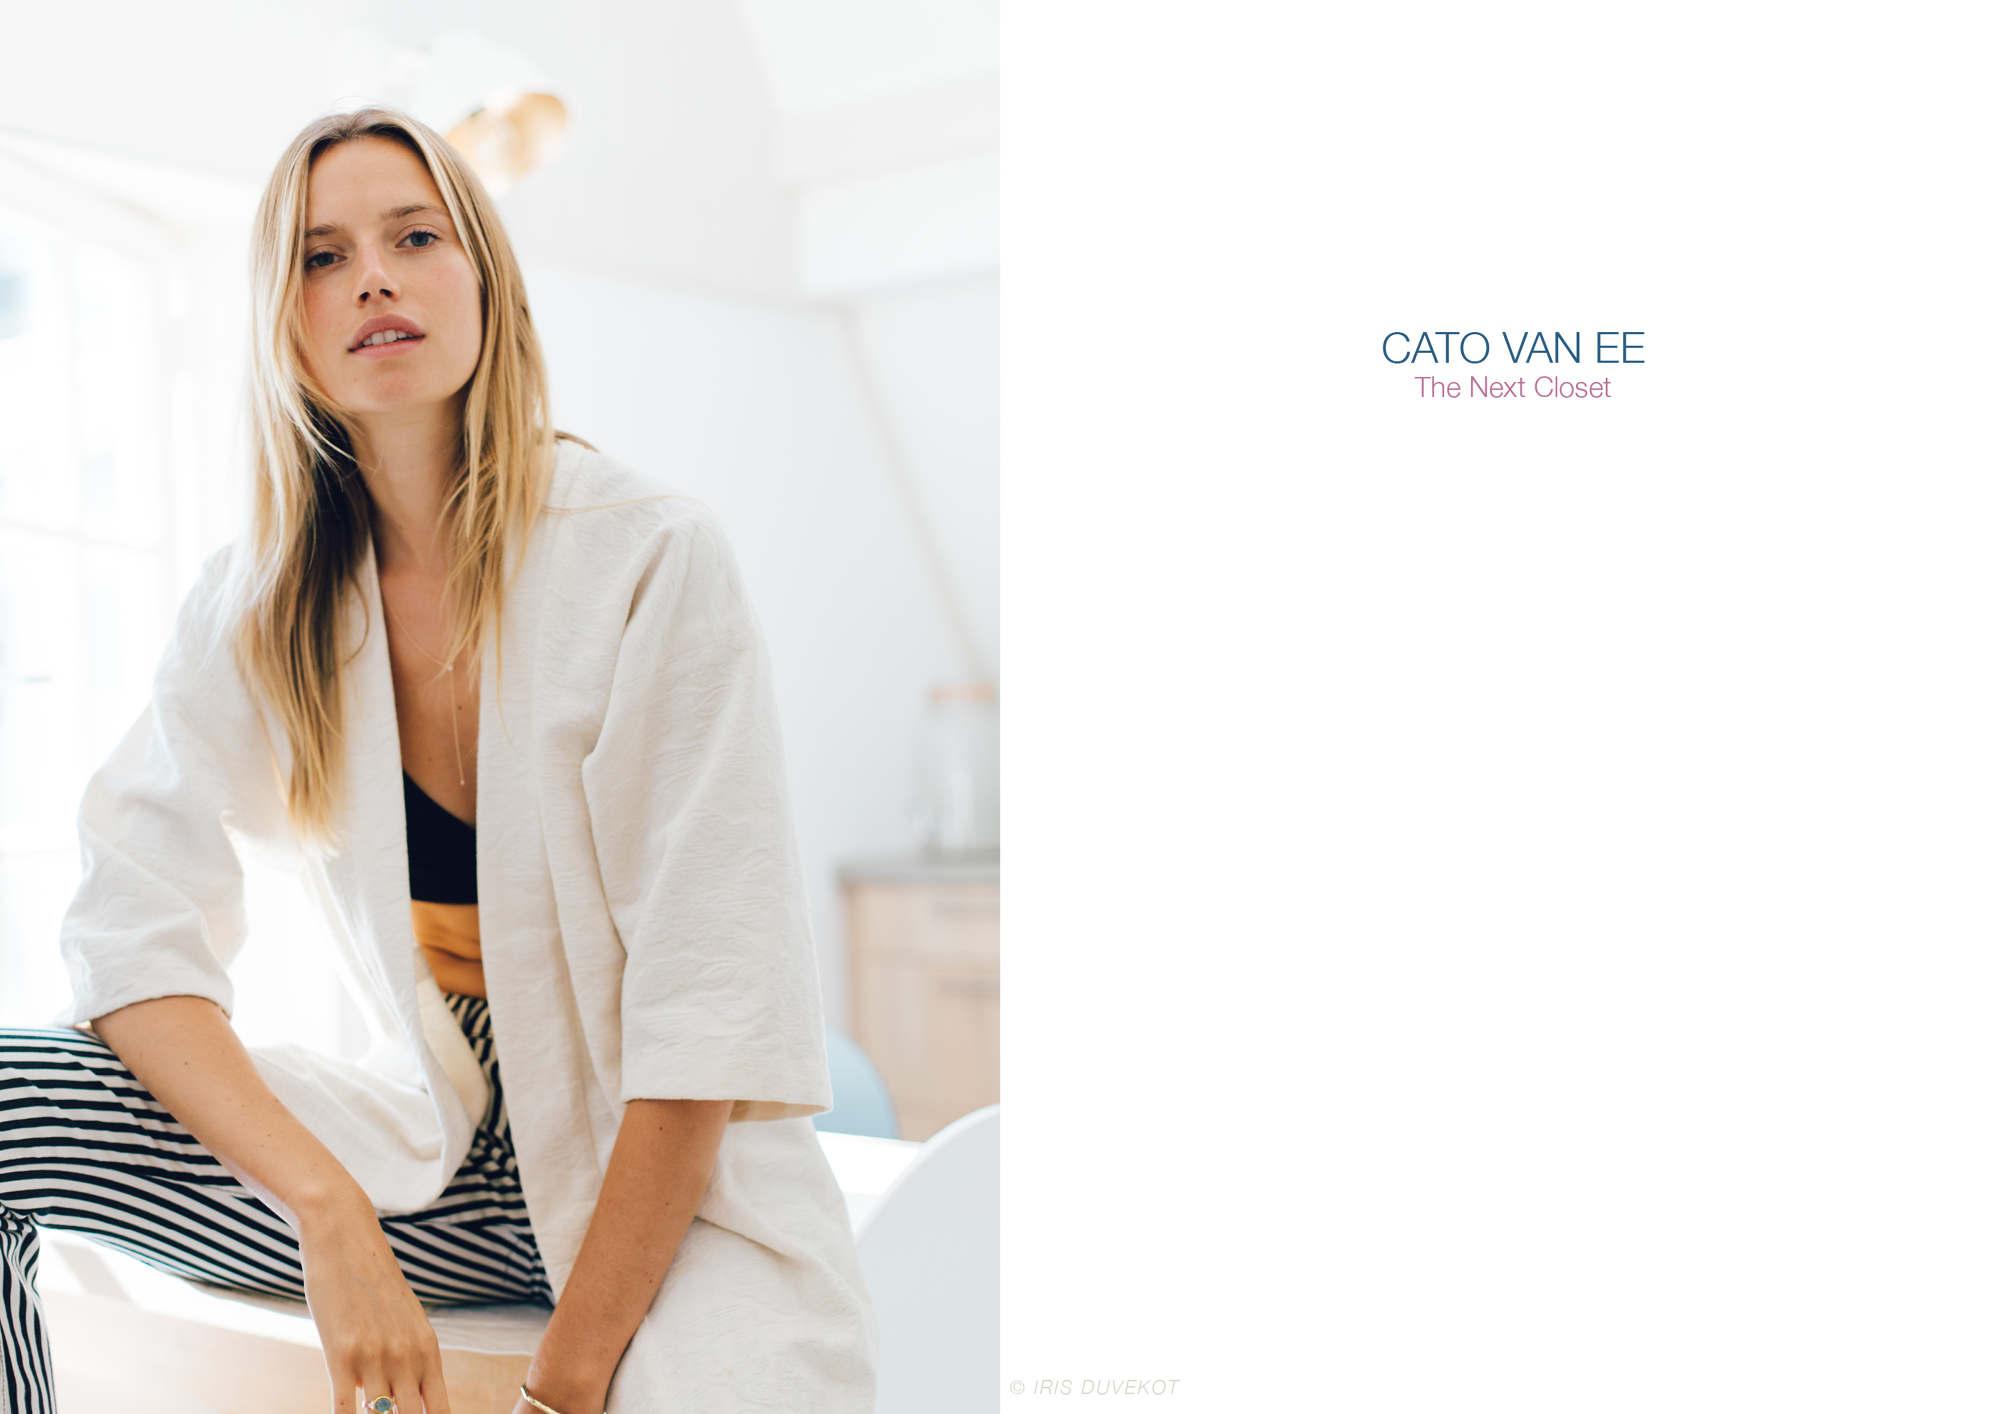 Cato - Iris Duvekot